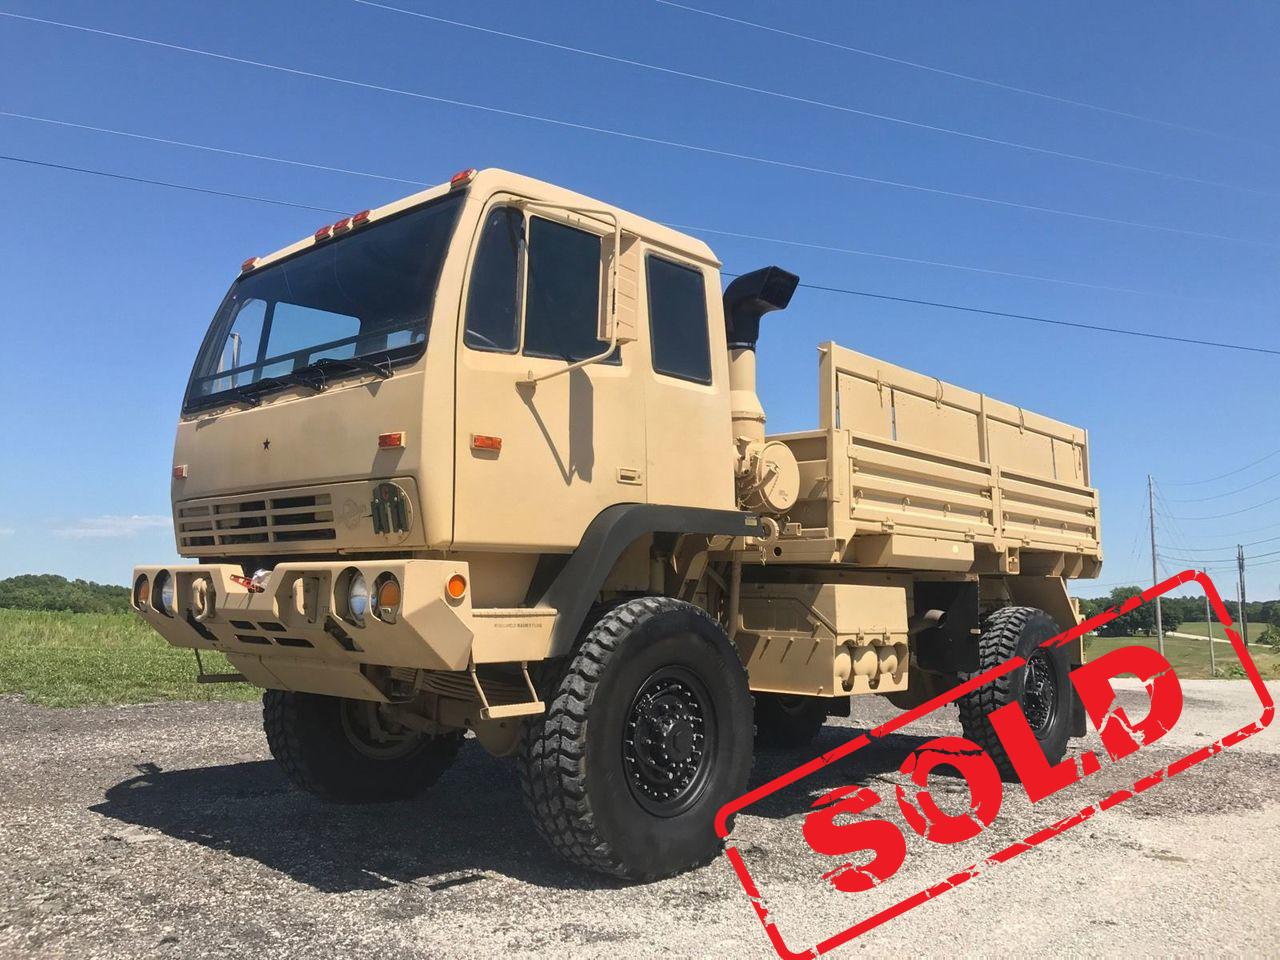 2000 Stewart And Stevenson M1078 Military 4x4 Lmtv Fmtv Truck Emp Unimog Midwest Military Equipment